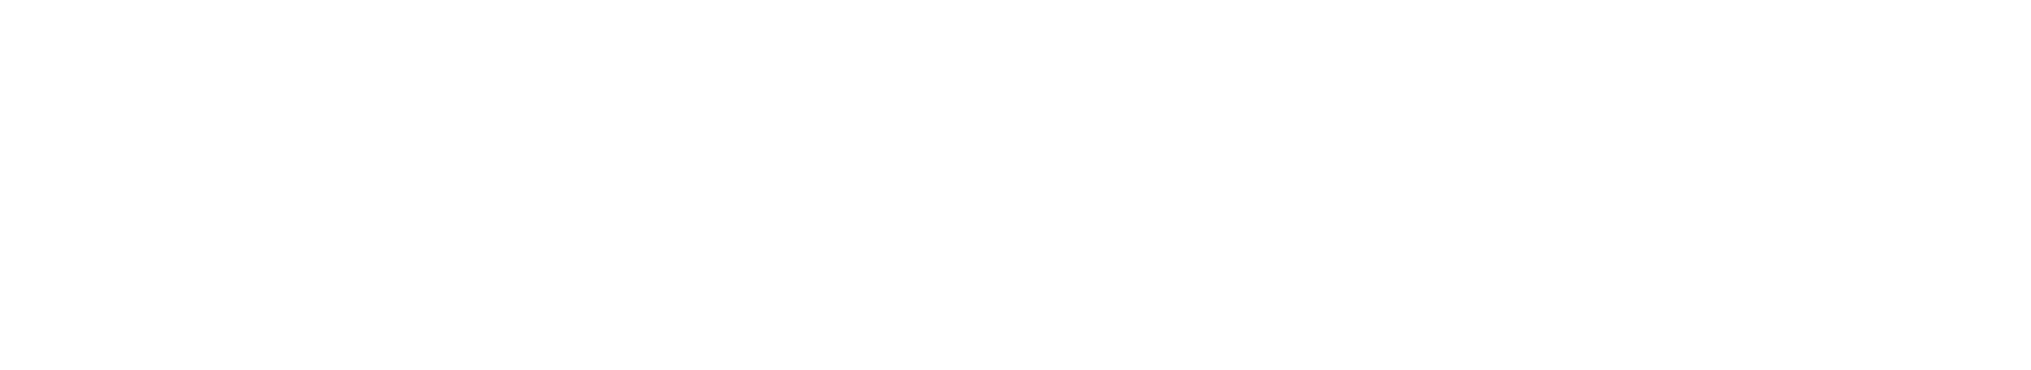 EIGLARSH HAPPINESS SYSTEMS